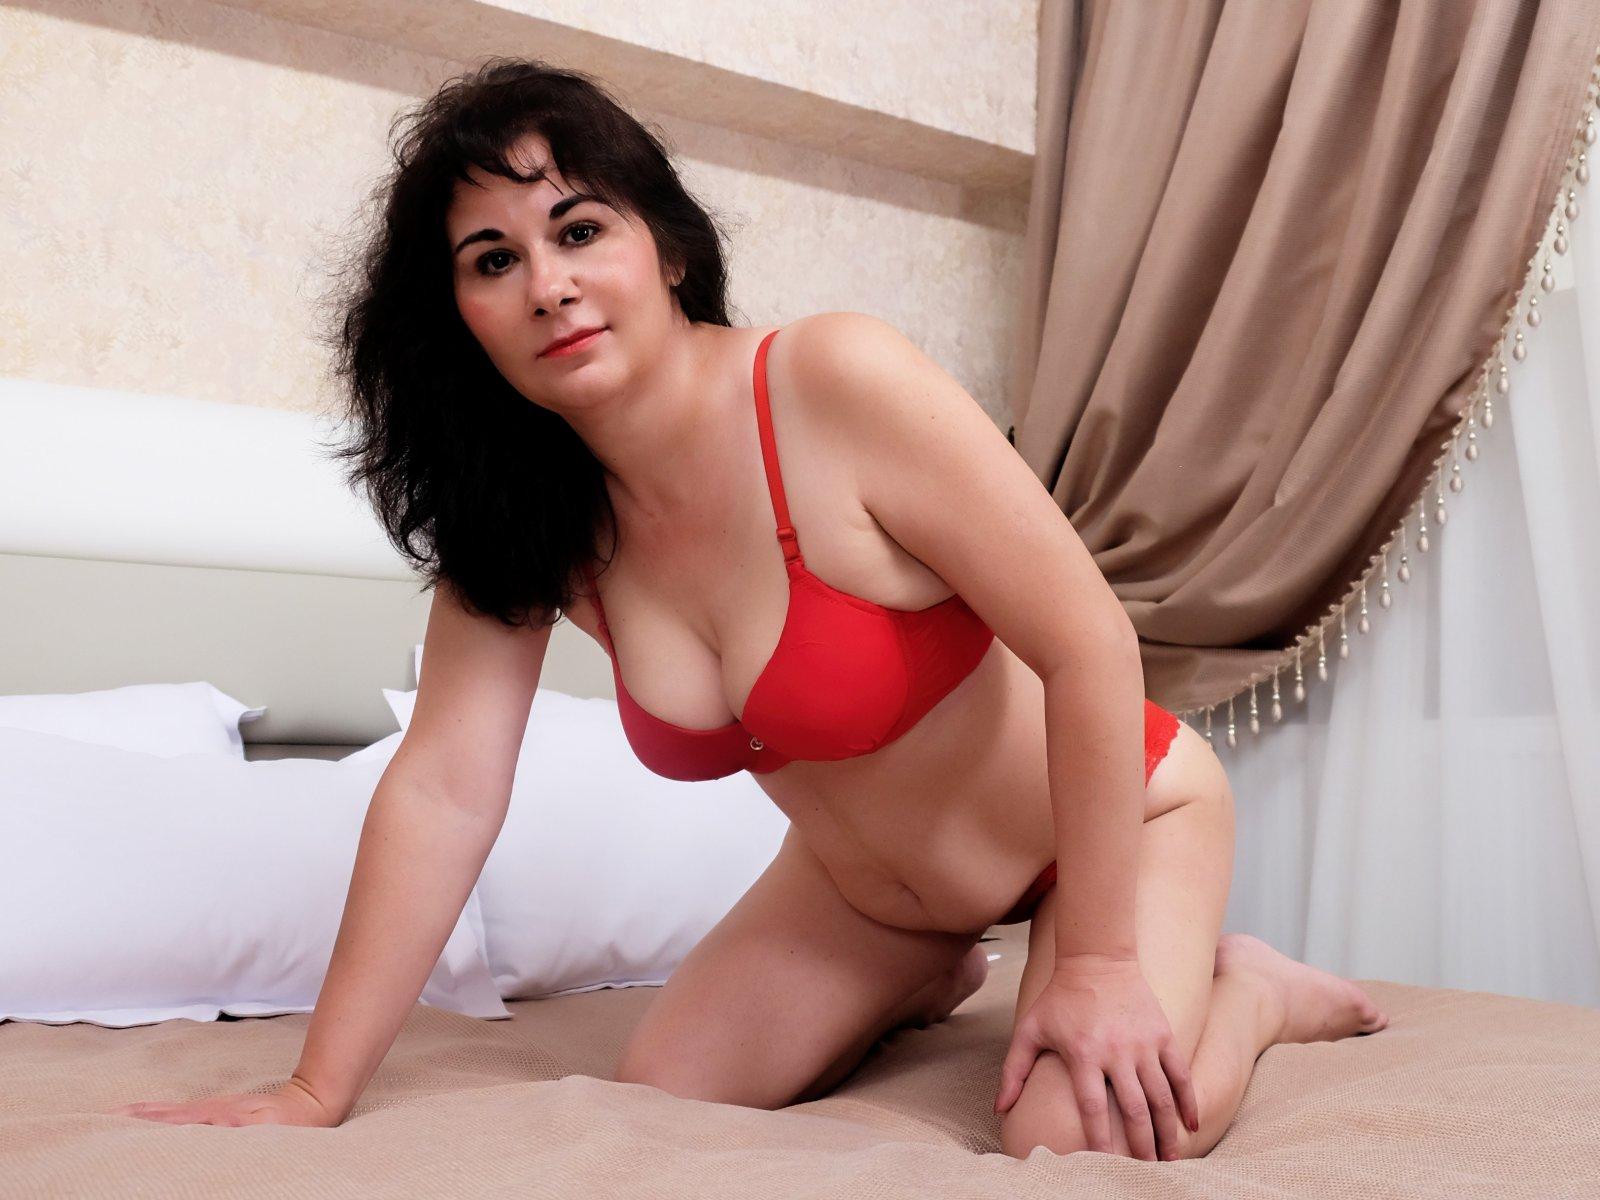 Зрелые самки онлайн, толстую спящую тещу трахают все